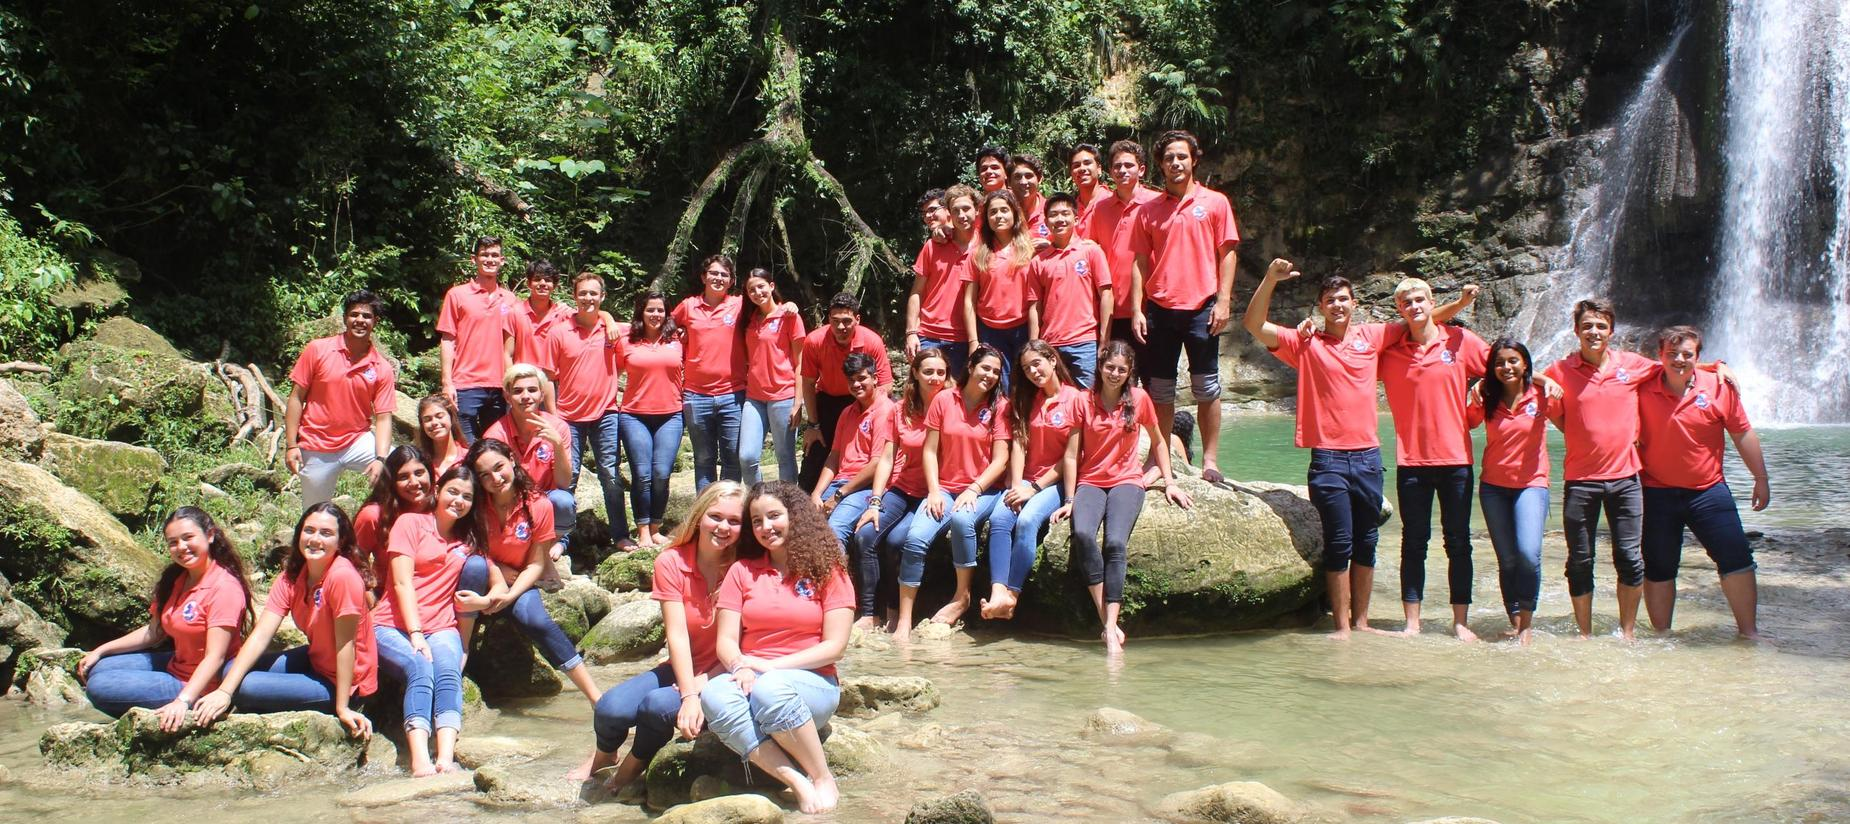 class of 2019 IB Diploma Program at The Baldwin School of Puerto Rico